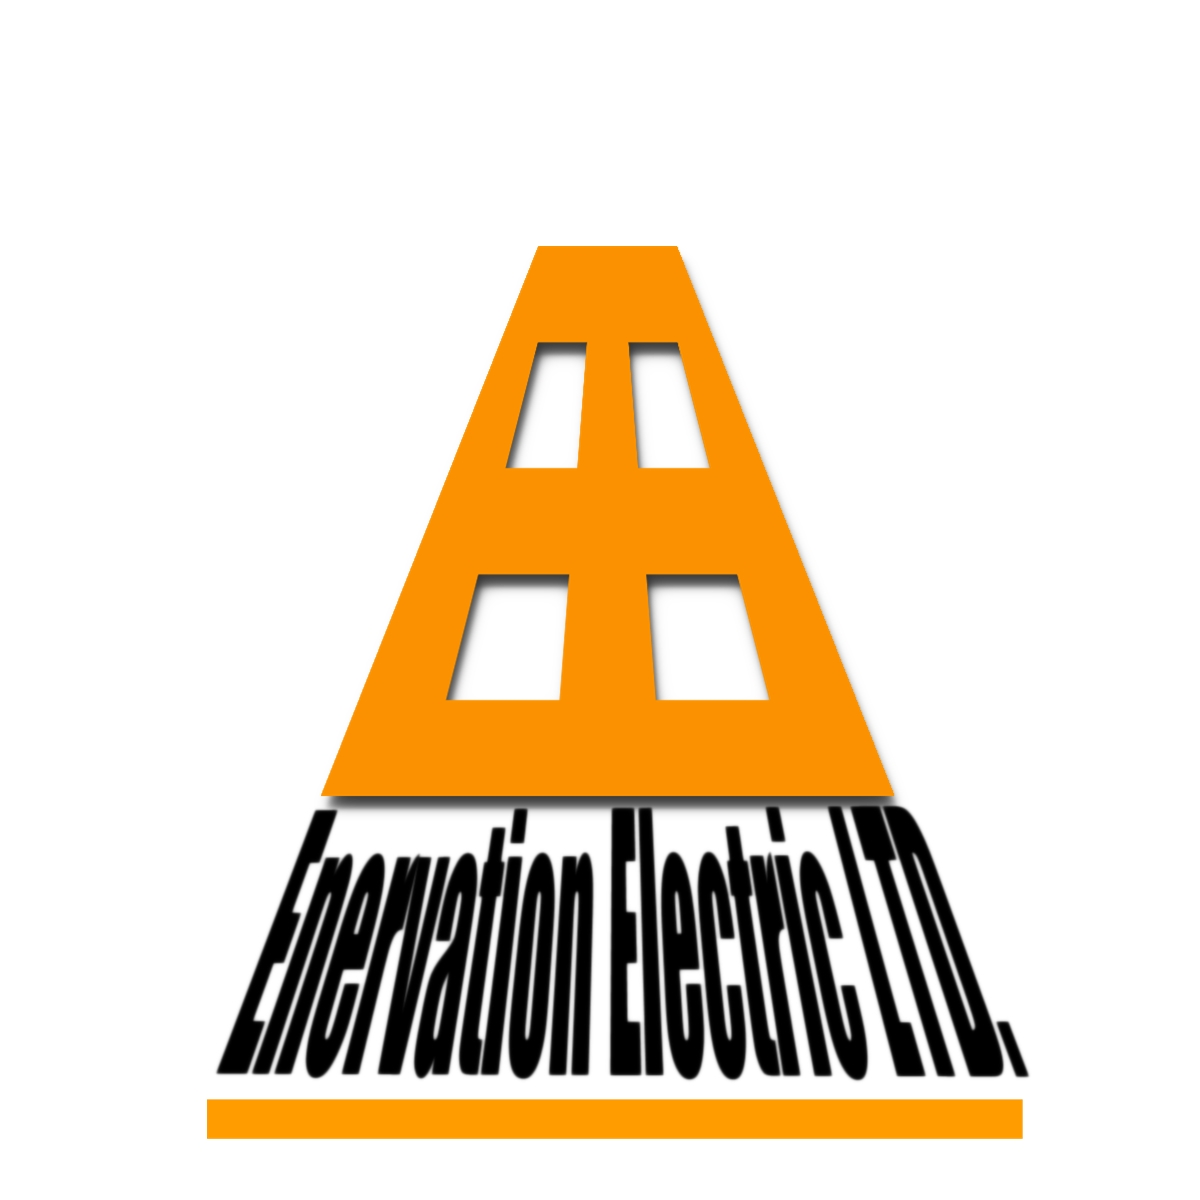 Business Card Design by Joseph calunsag Cagaanan - Entry No. 93 in the Business Card Design Contest Enervation Logo Design.